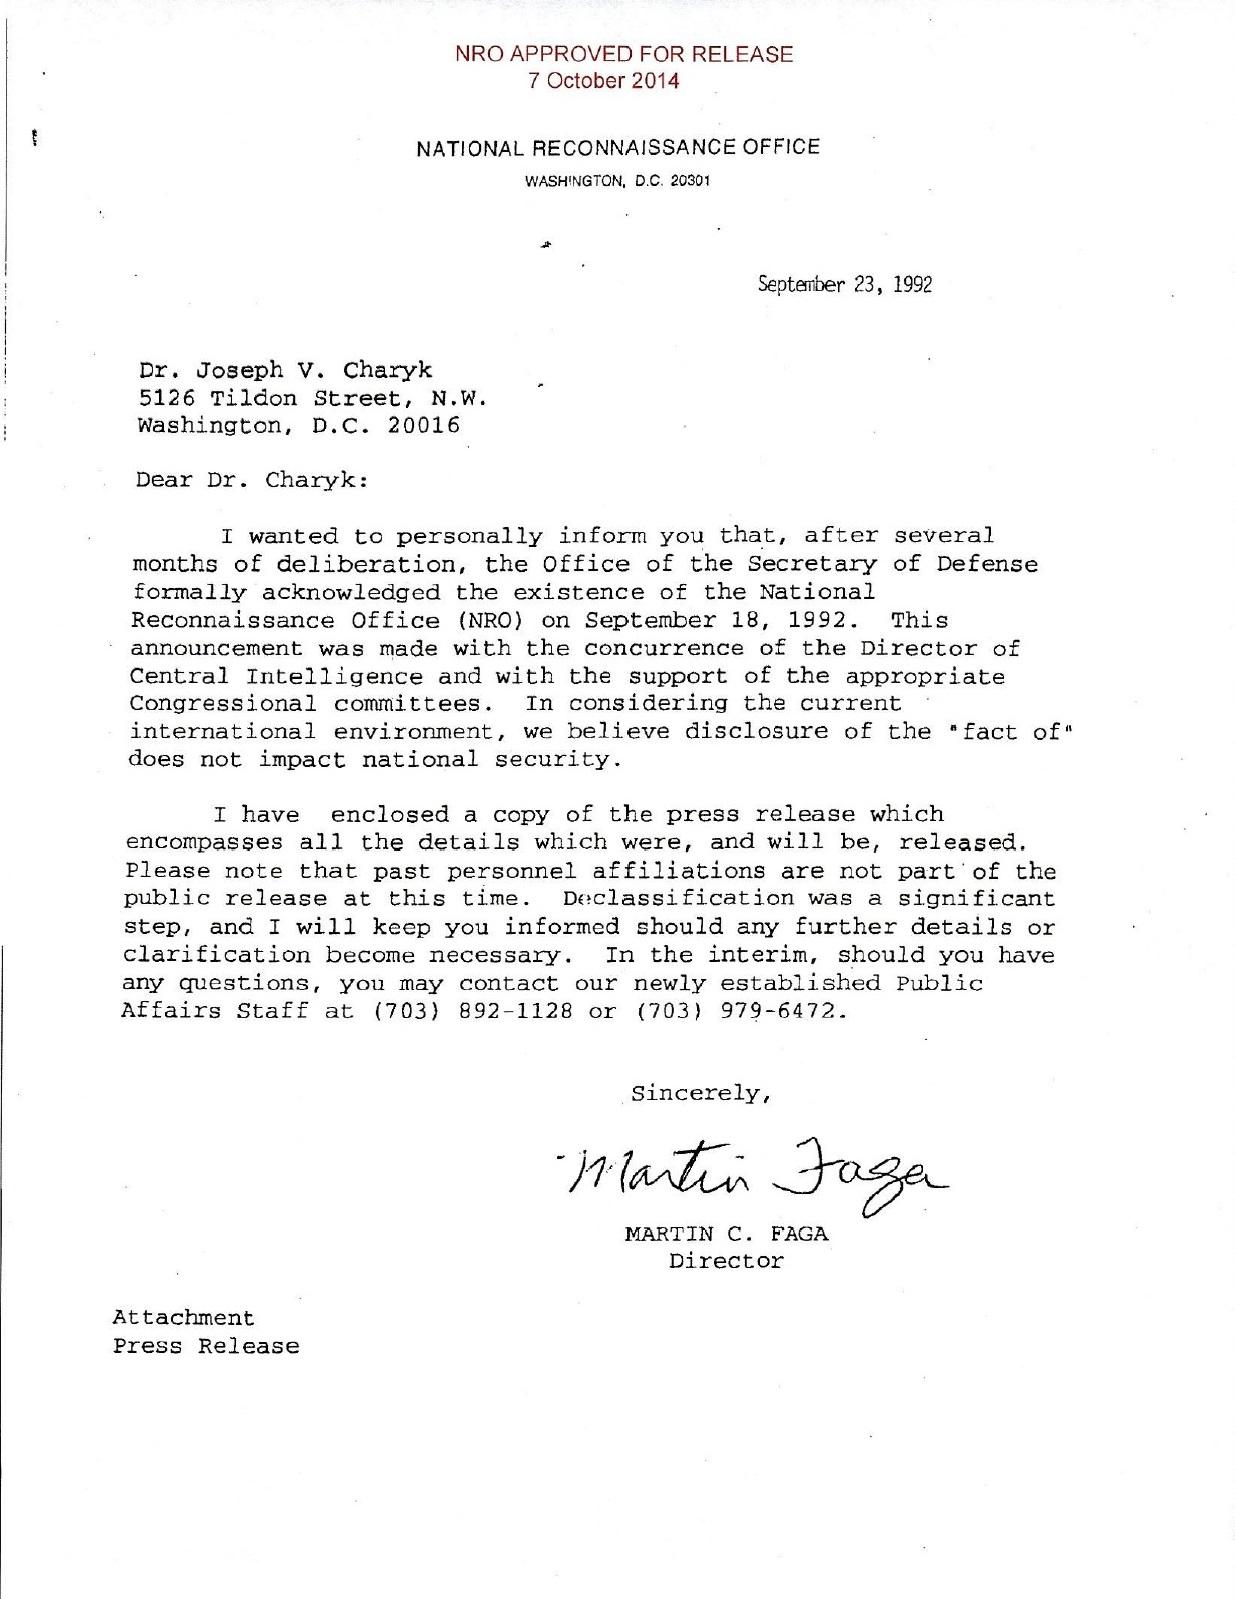 Letter Declassifying the NRO